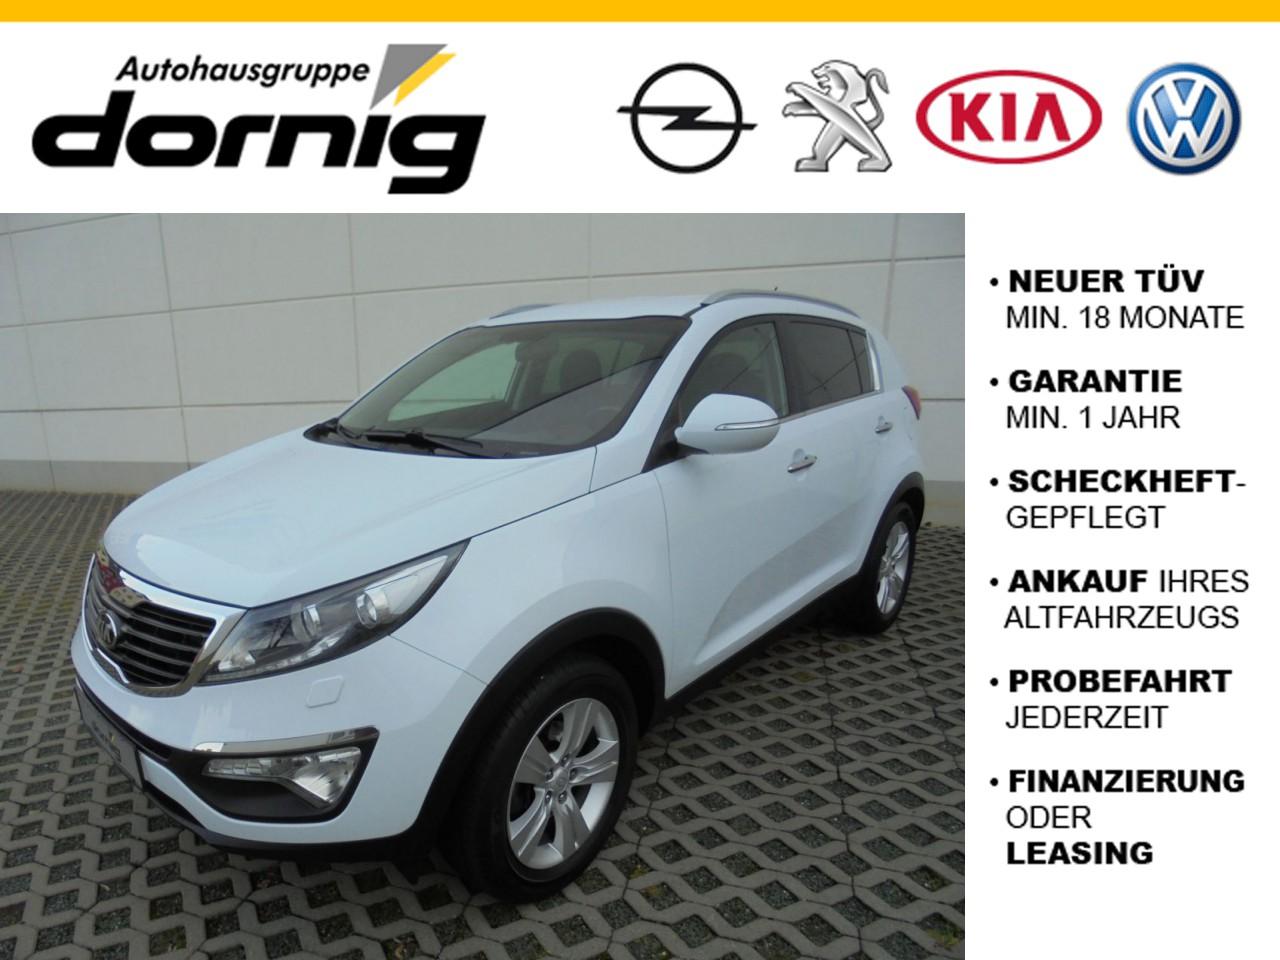 Kia Sportage 1.6 GDI 2WD Vision, SH, Xenon, Jahr 2013, Benzin